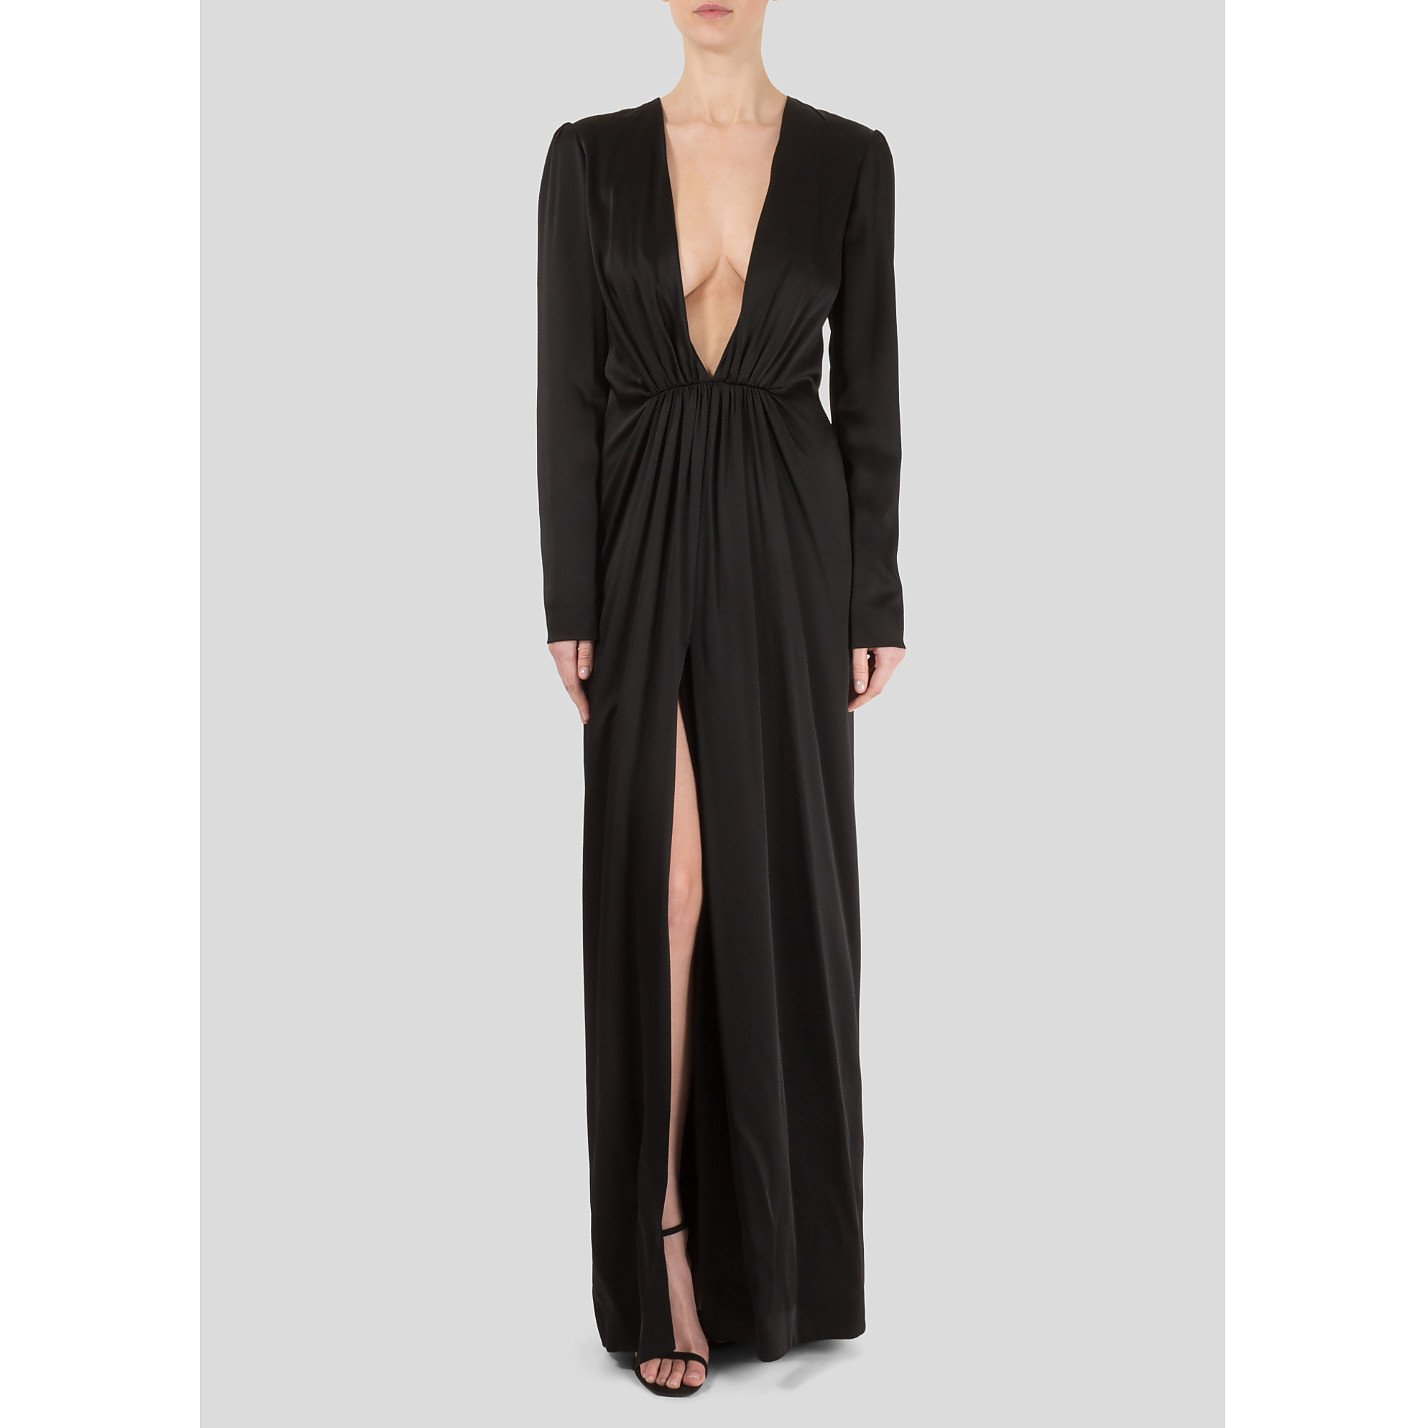 Saint Laurent Plunging V-Neck Gown